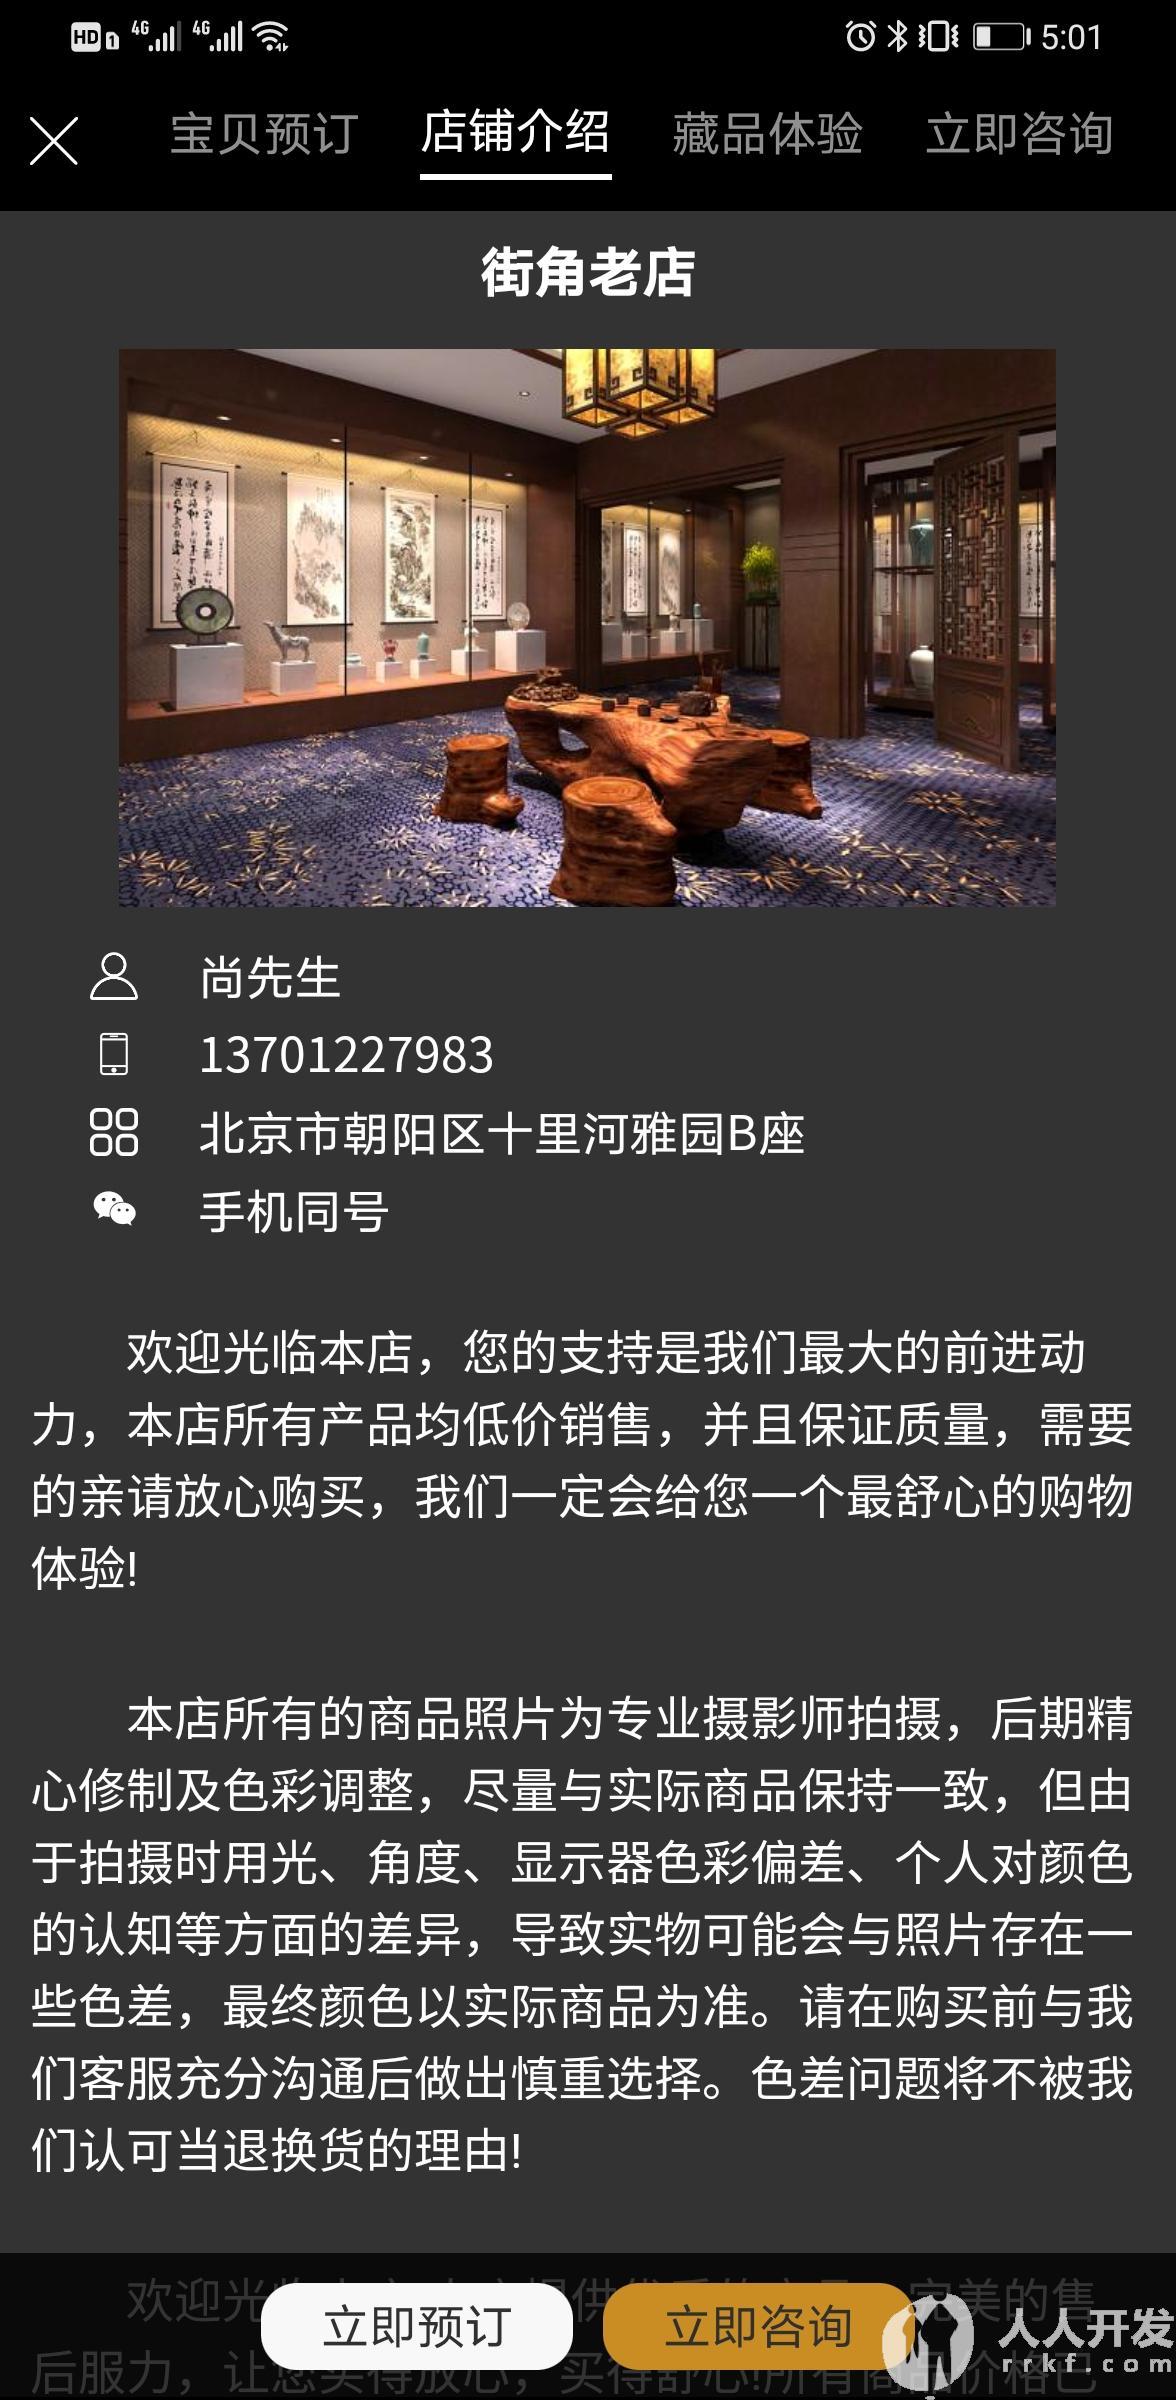 Screenshot_20210423_170150_com.yiyuanyoudao.app.jpg